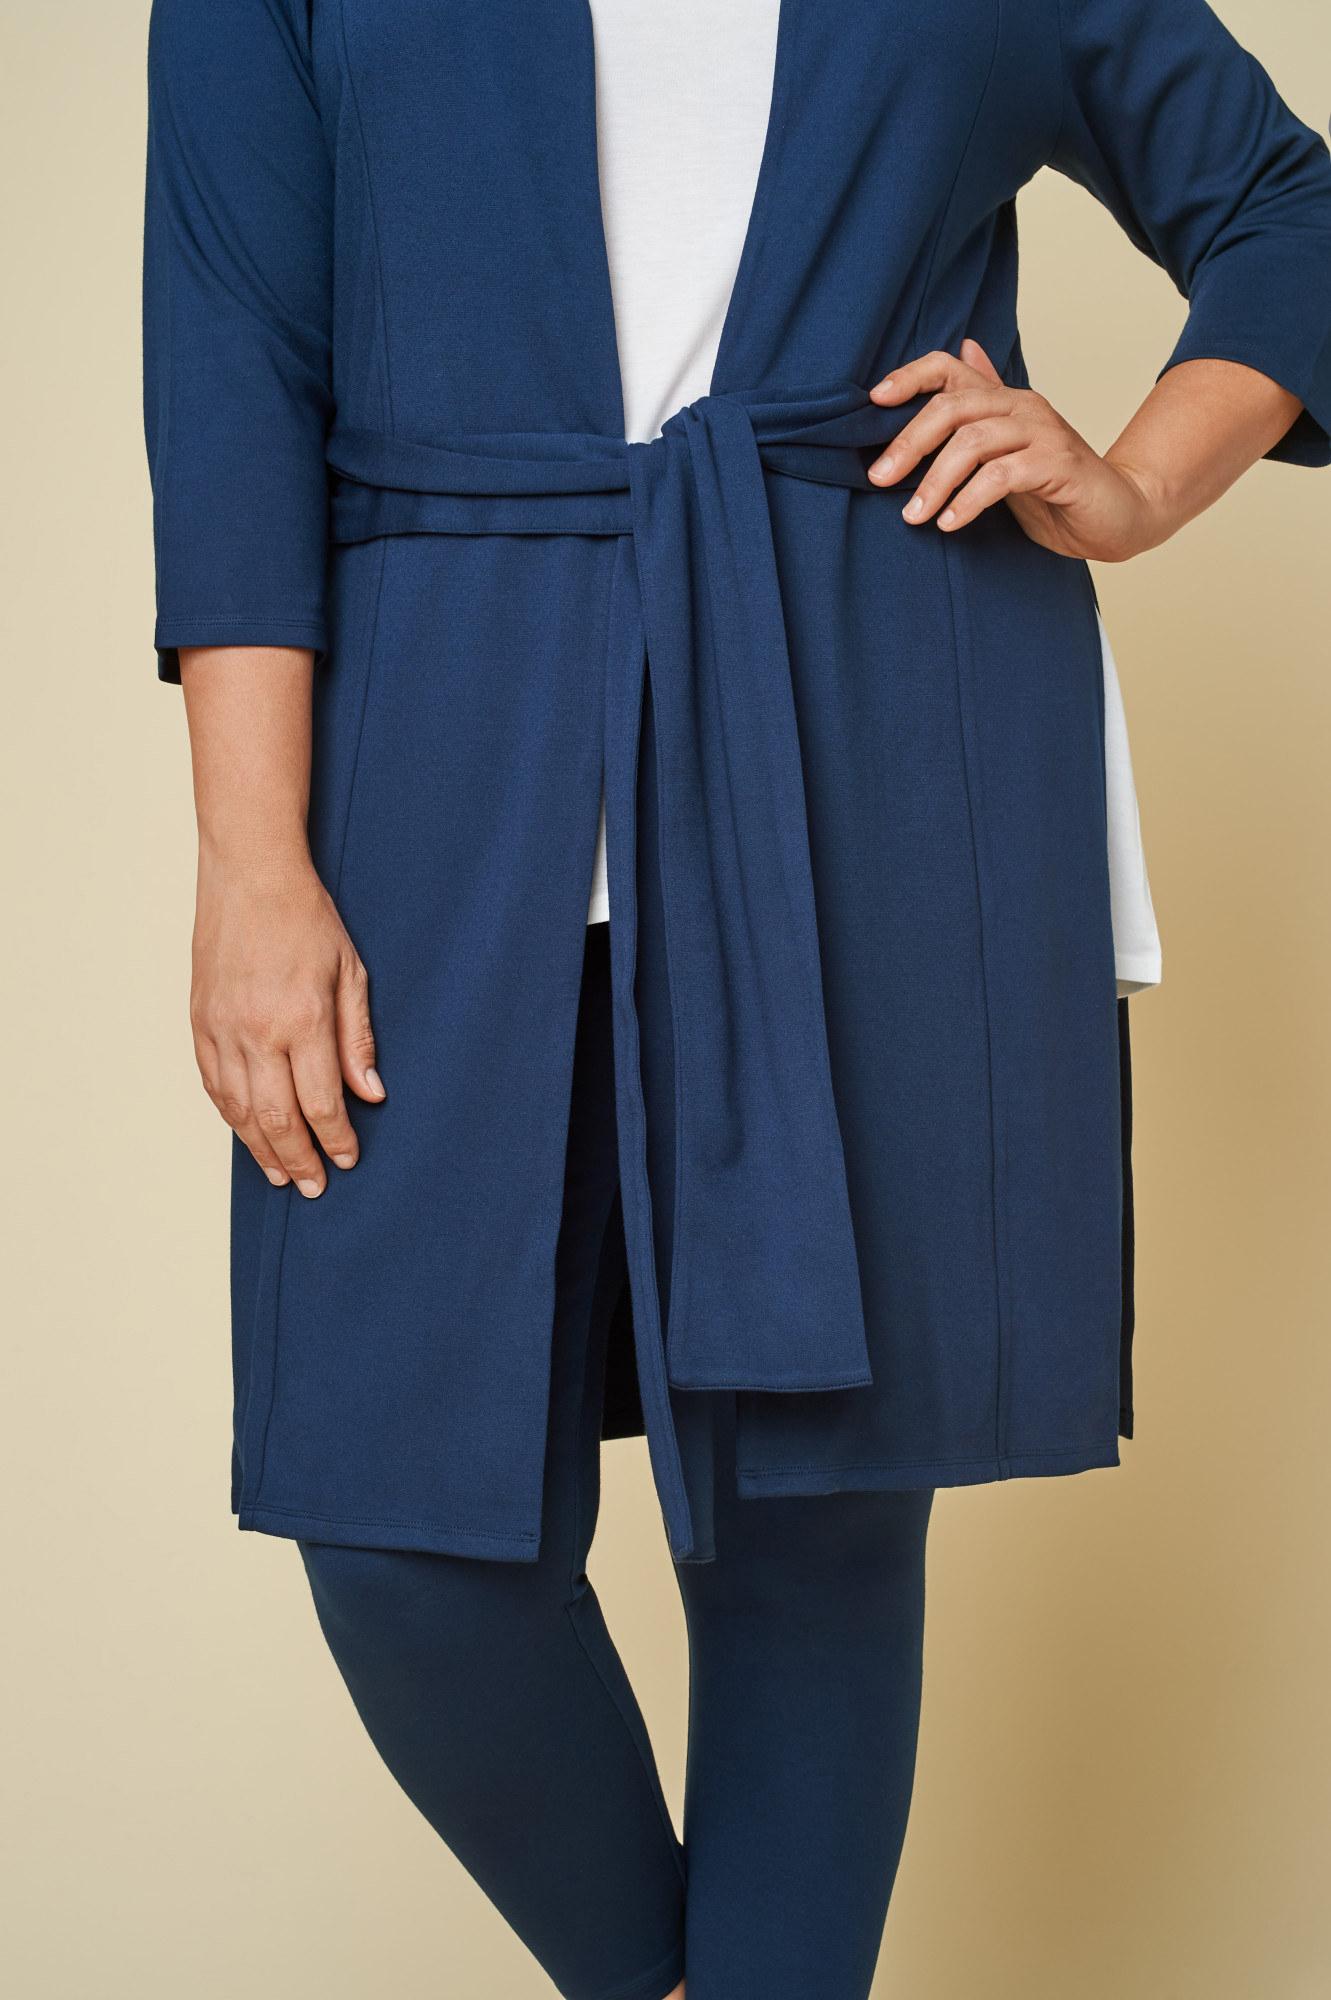 Model wears the long belted cardigan in navy